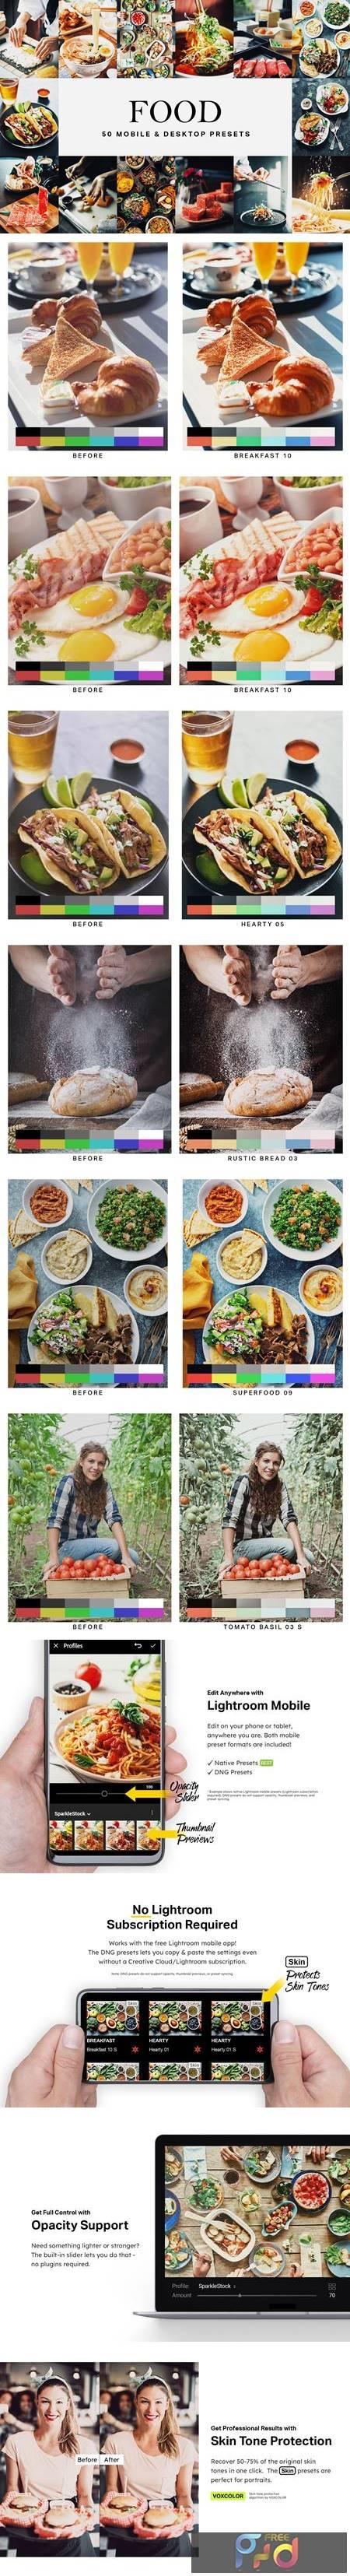 50 Food Lightroom Presets and LUTs 4761224 1